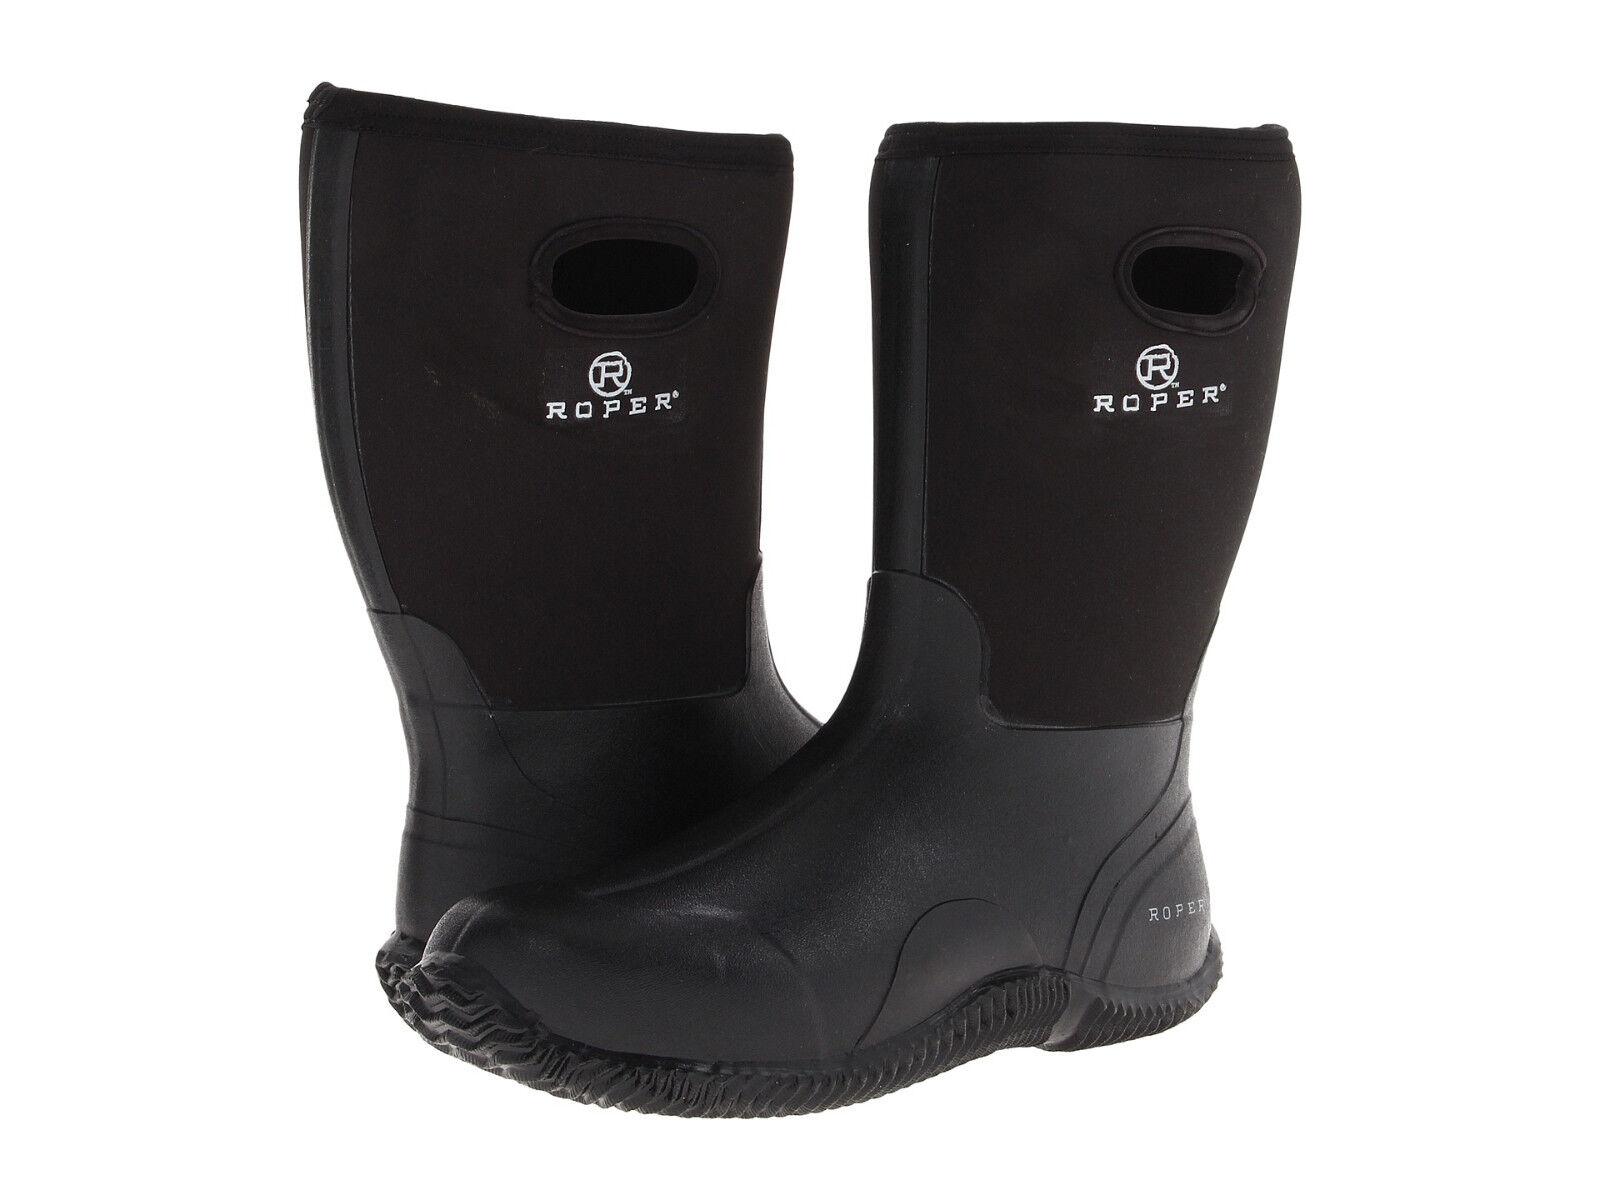 Roper Men's Neoprene Barn Boot (See fit description below)